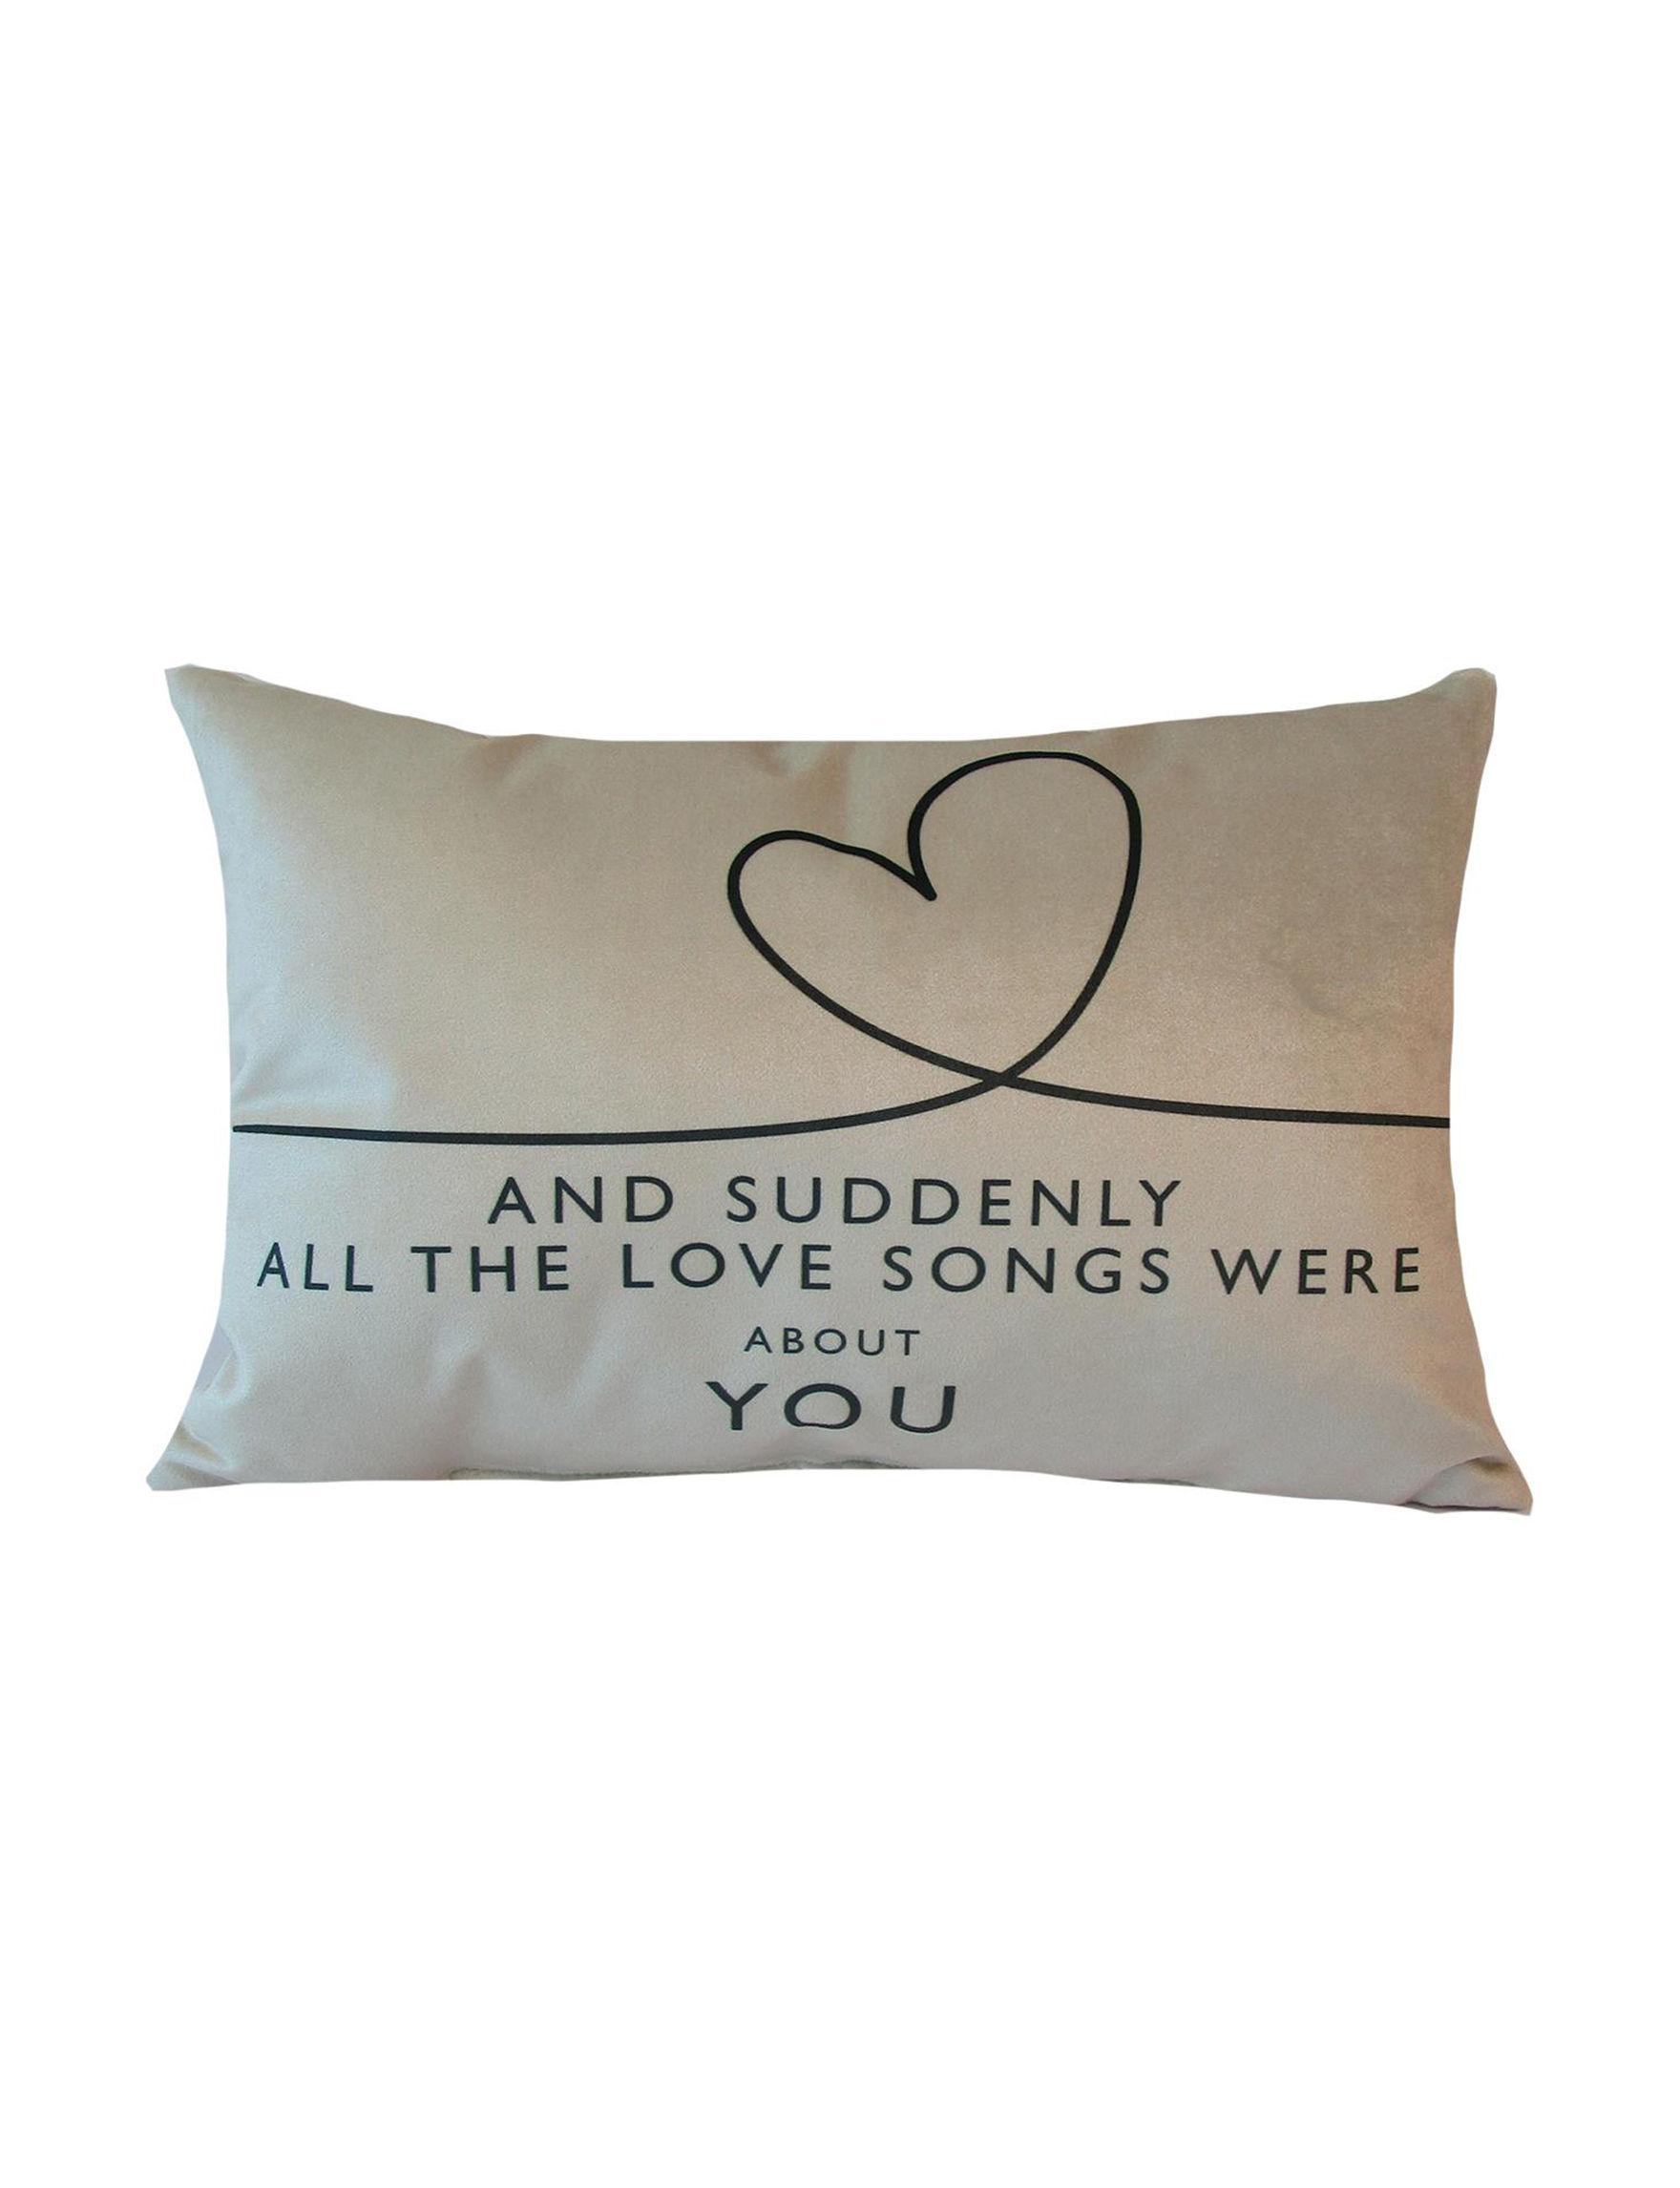 Home Fashions International Natural Decorative Pillows